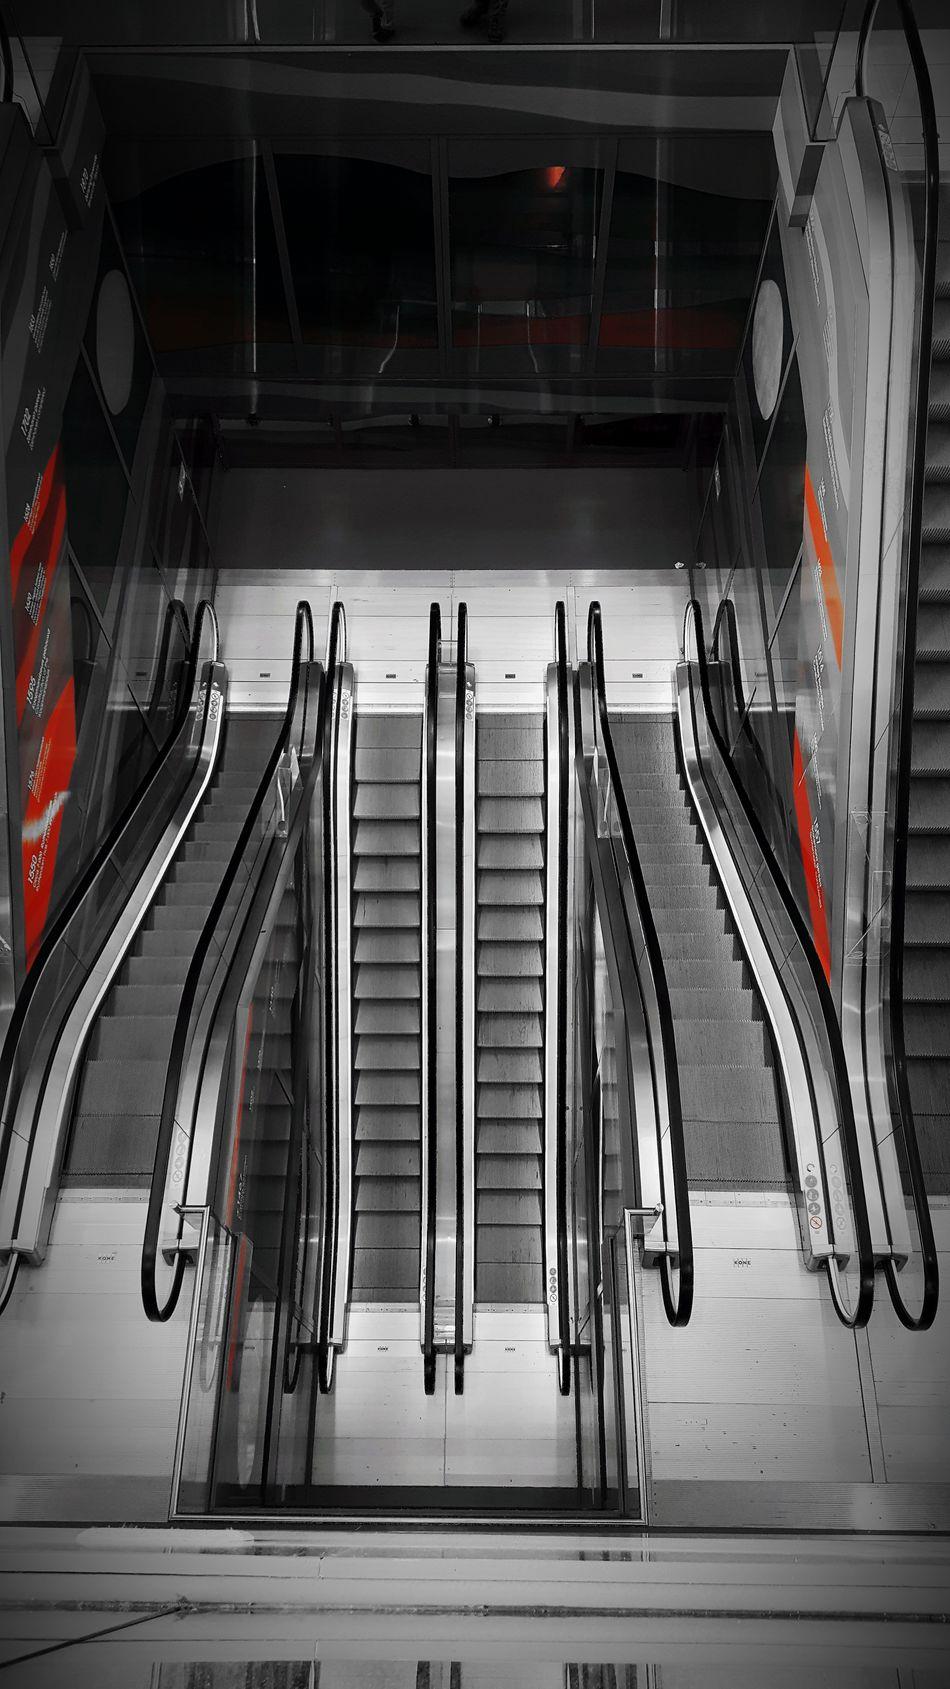 Moving Stairs Markthalrotterdam Scool Trip Rainy Day 💧🌫